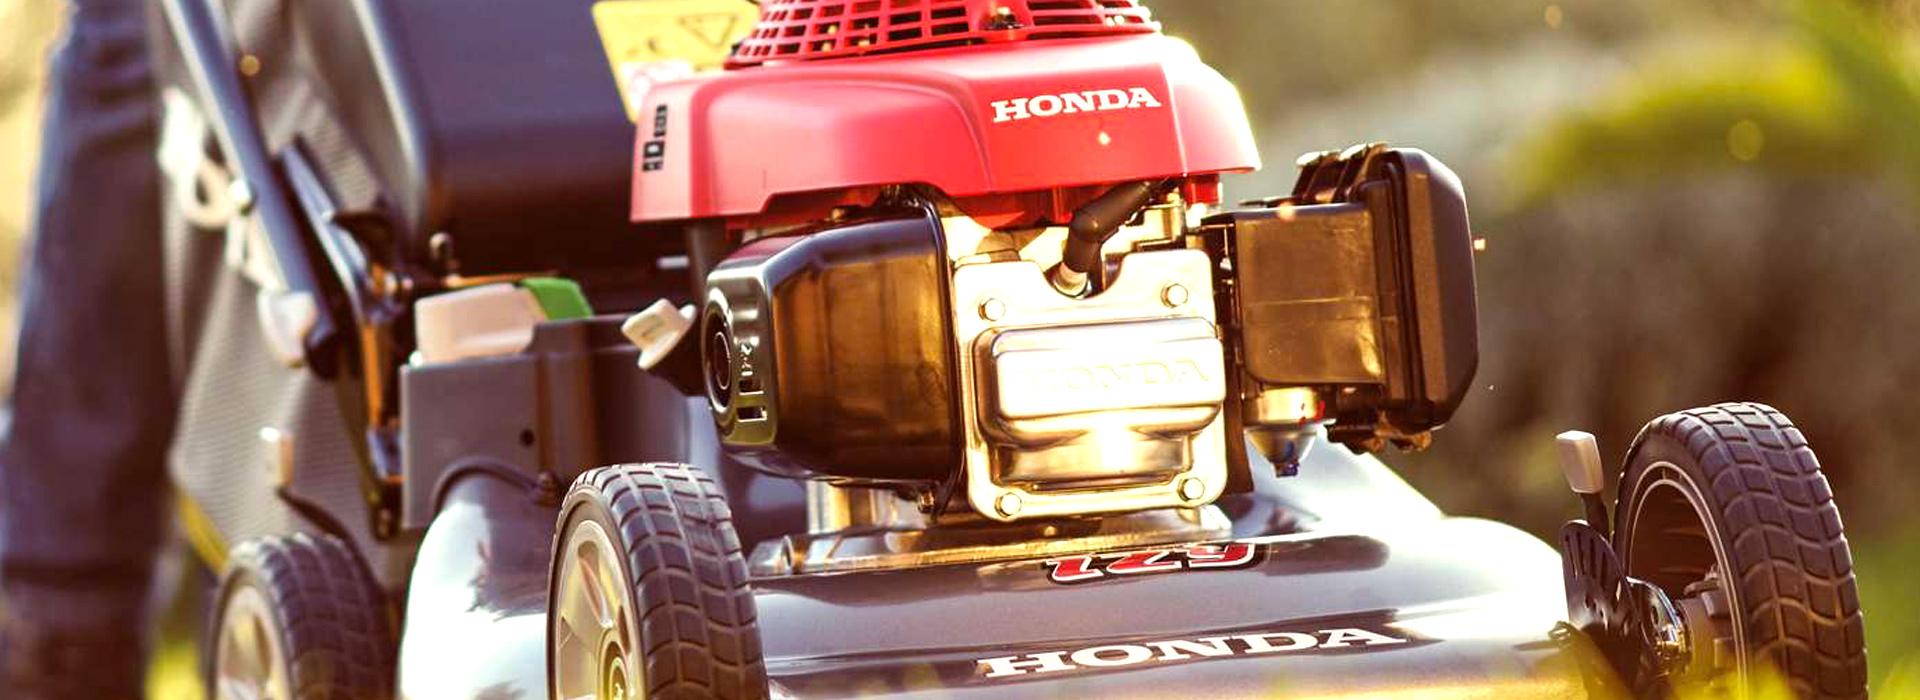 Tondeuse Honda